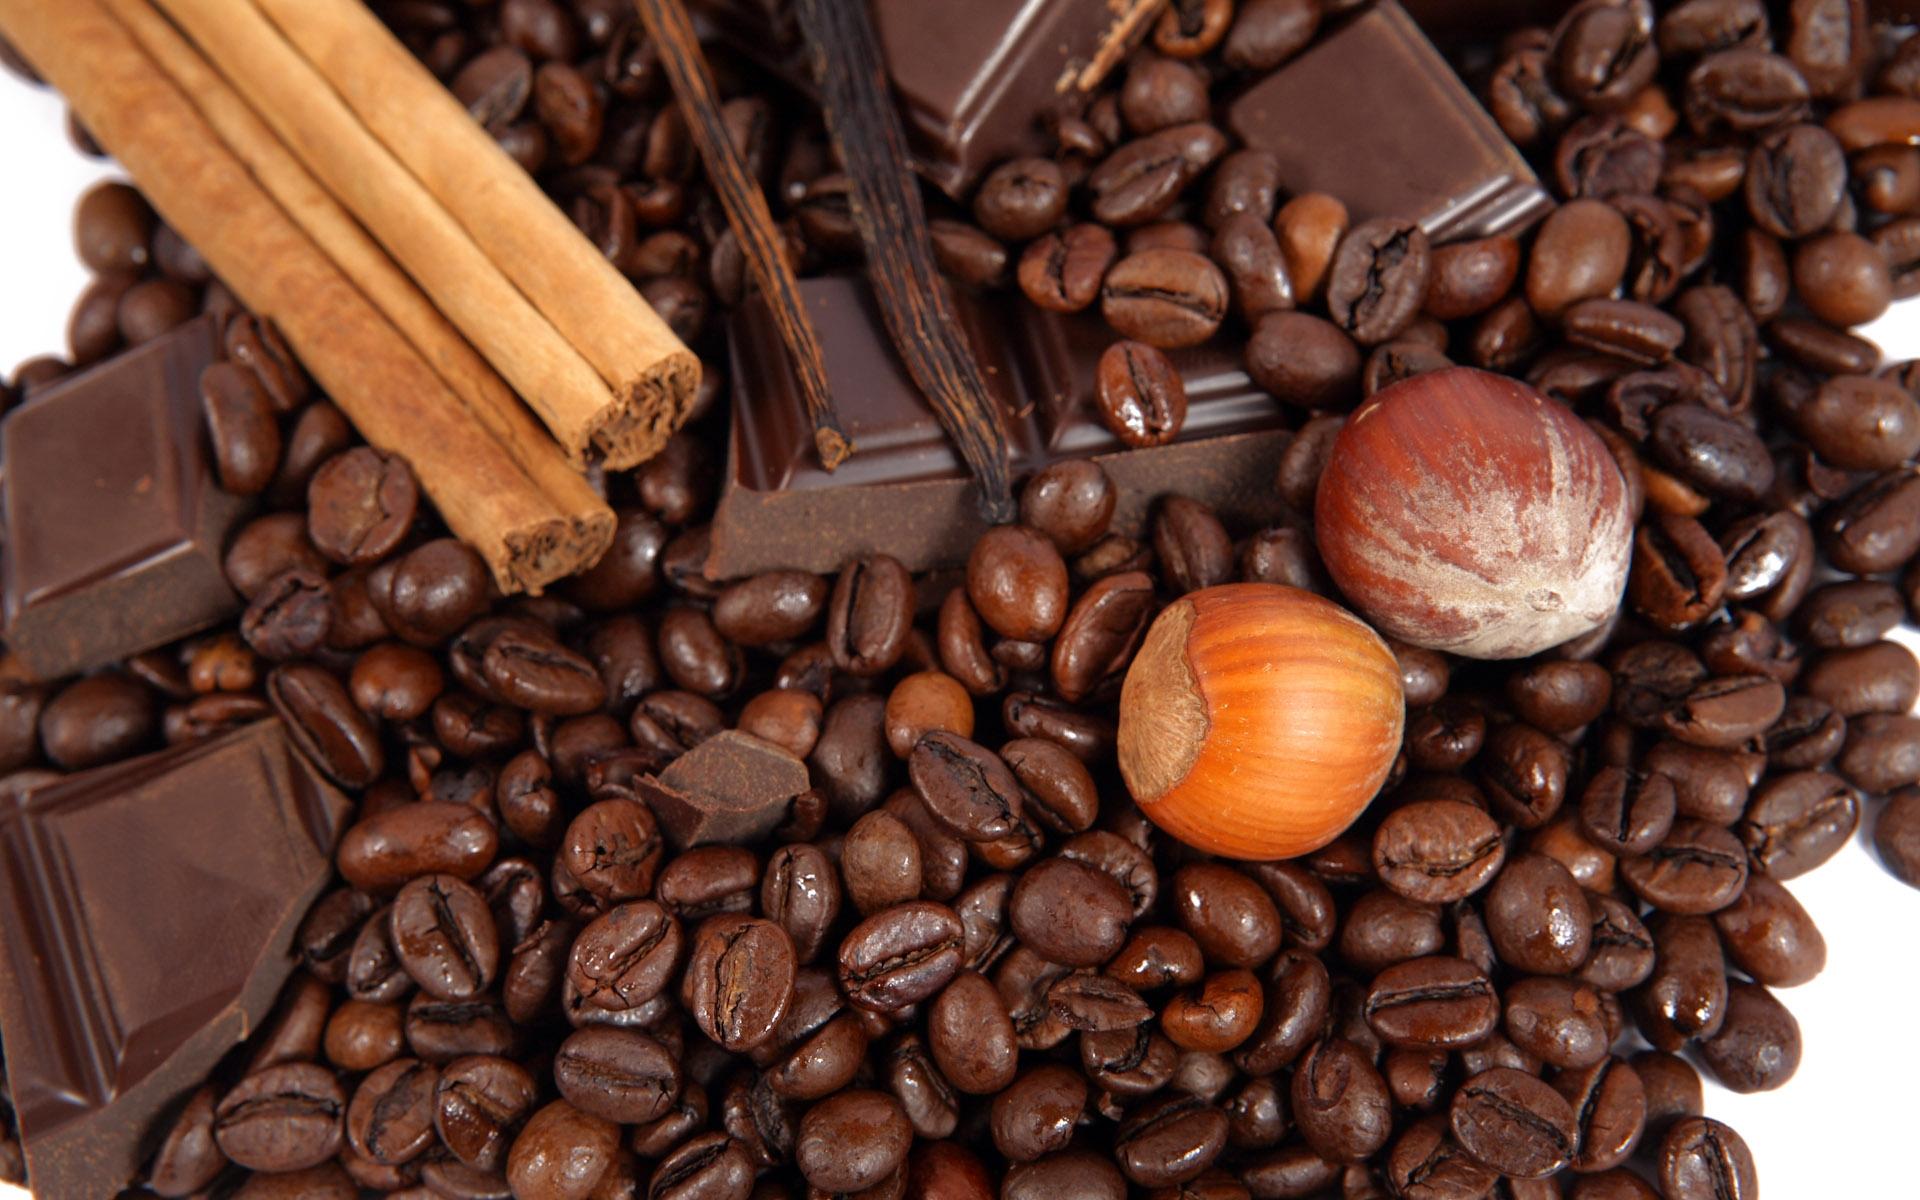 картинки кофе и шоколад фон как правило